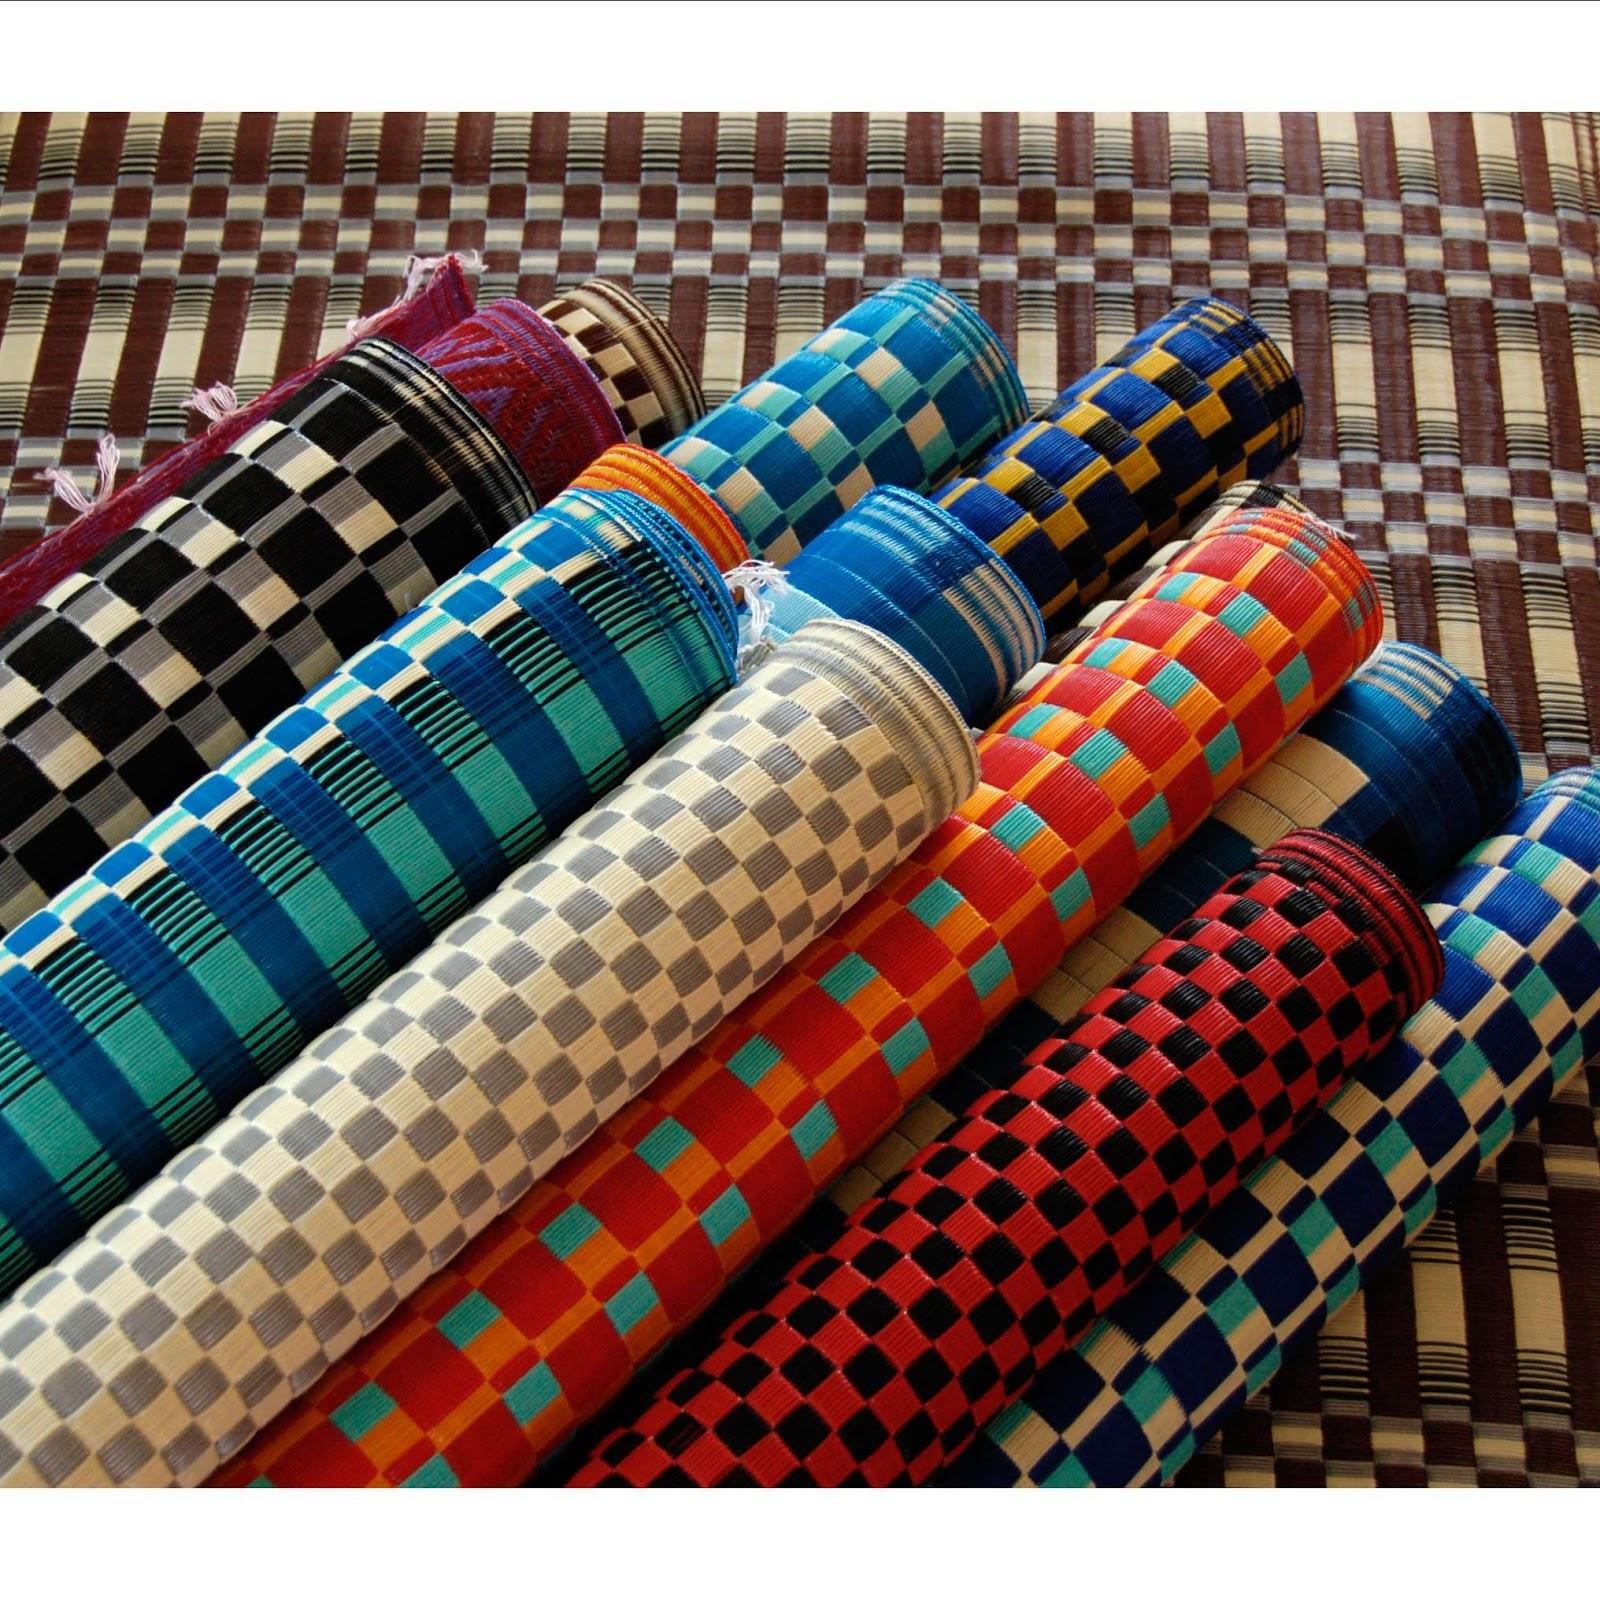 Polypropylene carpets RDHXWPW